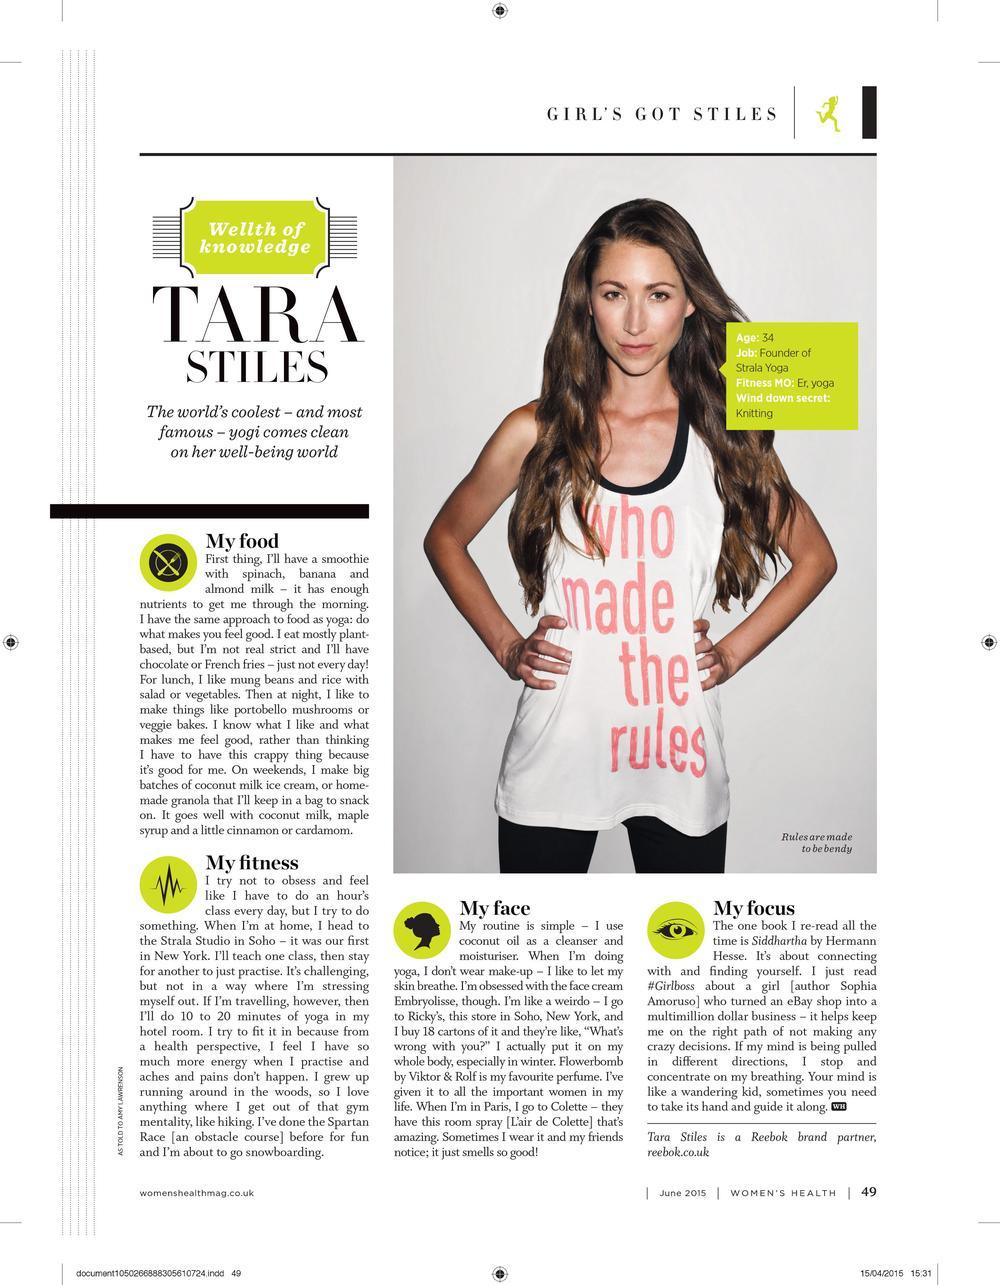 Wealth of Knowledge: Tara Stiles